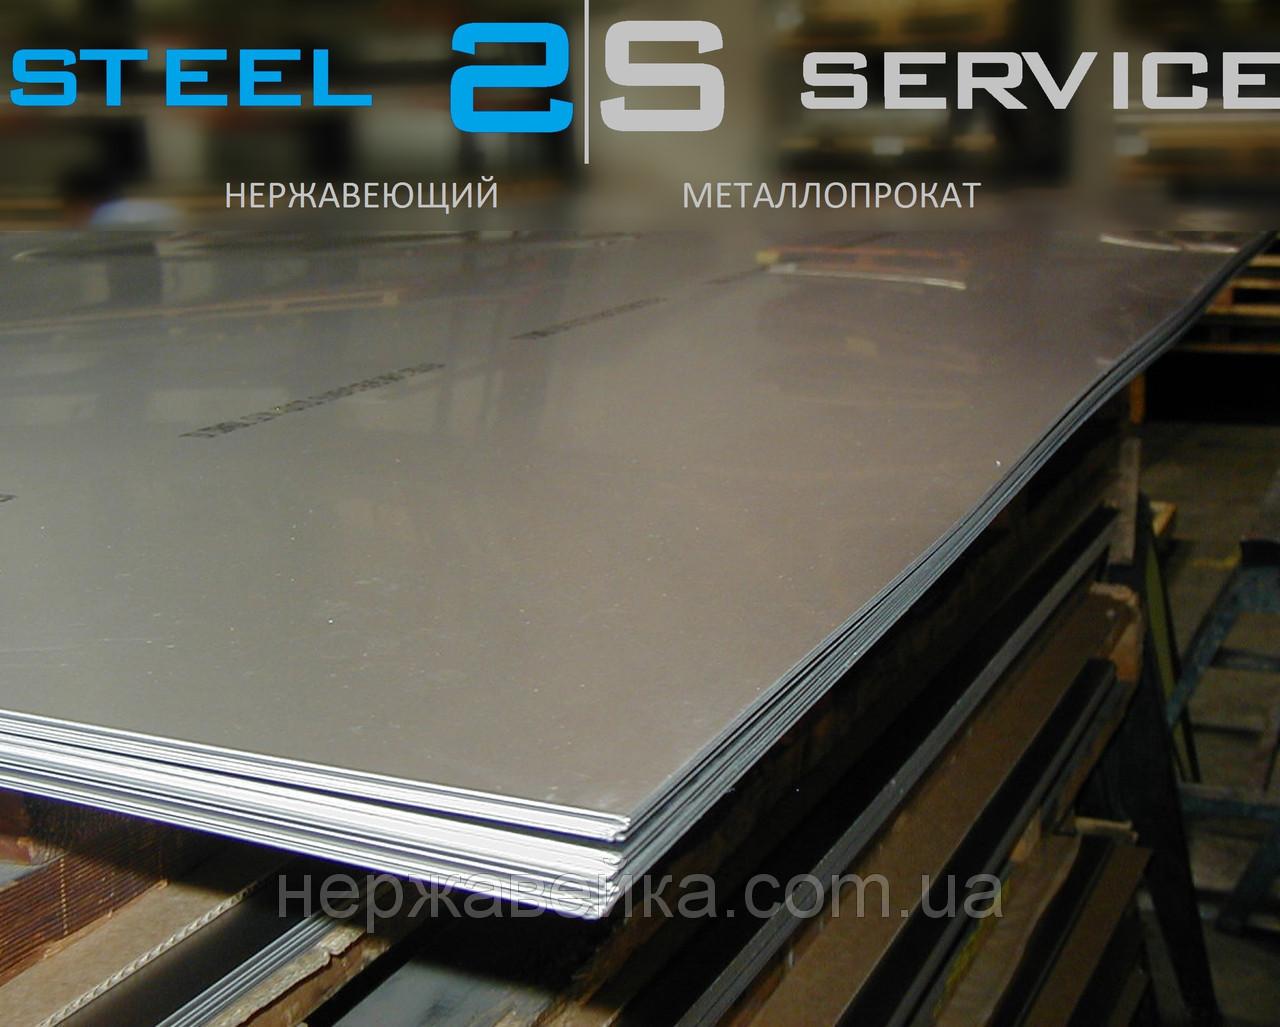 Нержавейка лист 12х1500х6000мм  AISI 316Ti(10Х17Н13М2Т) F1 - горячекатанный,  кислотостойкий